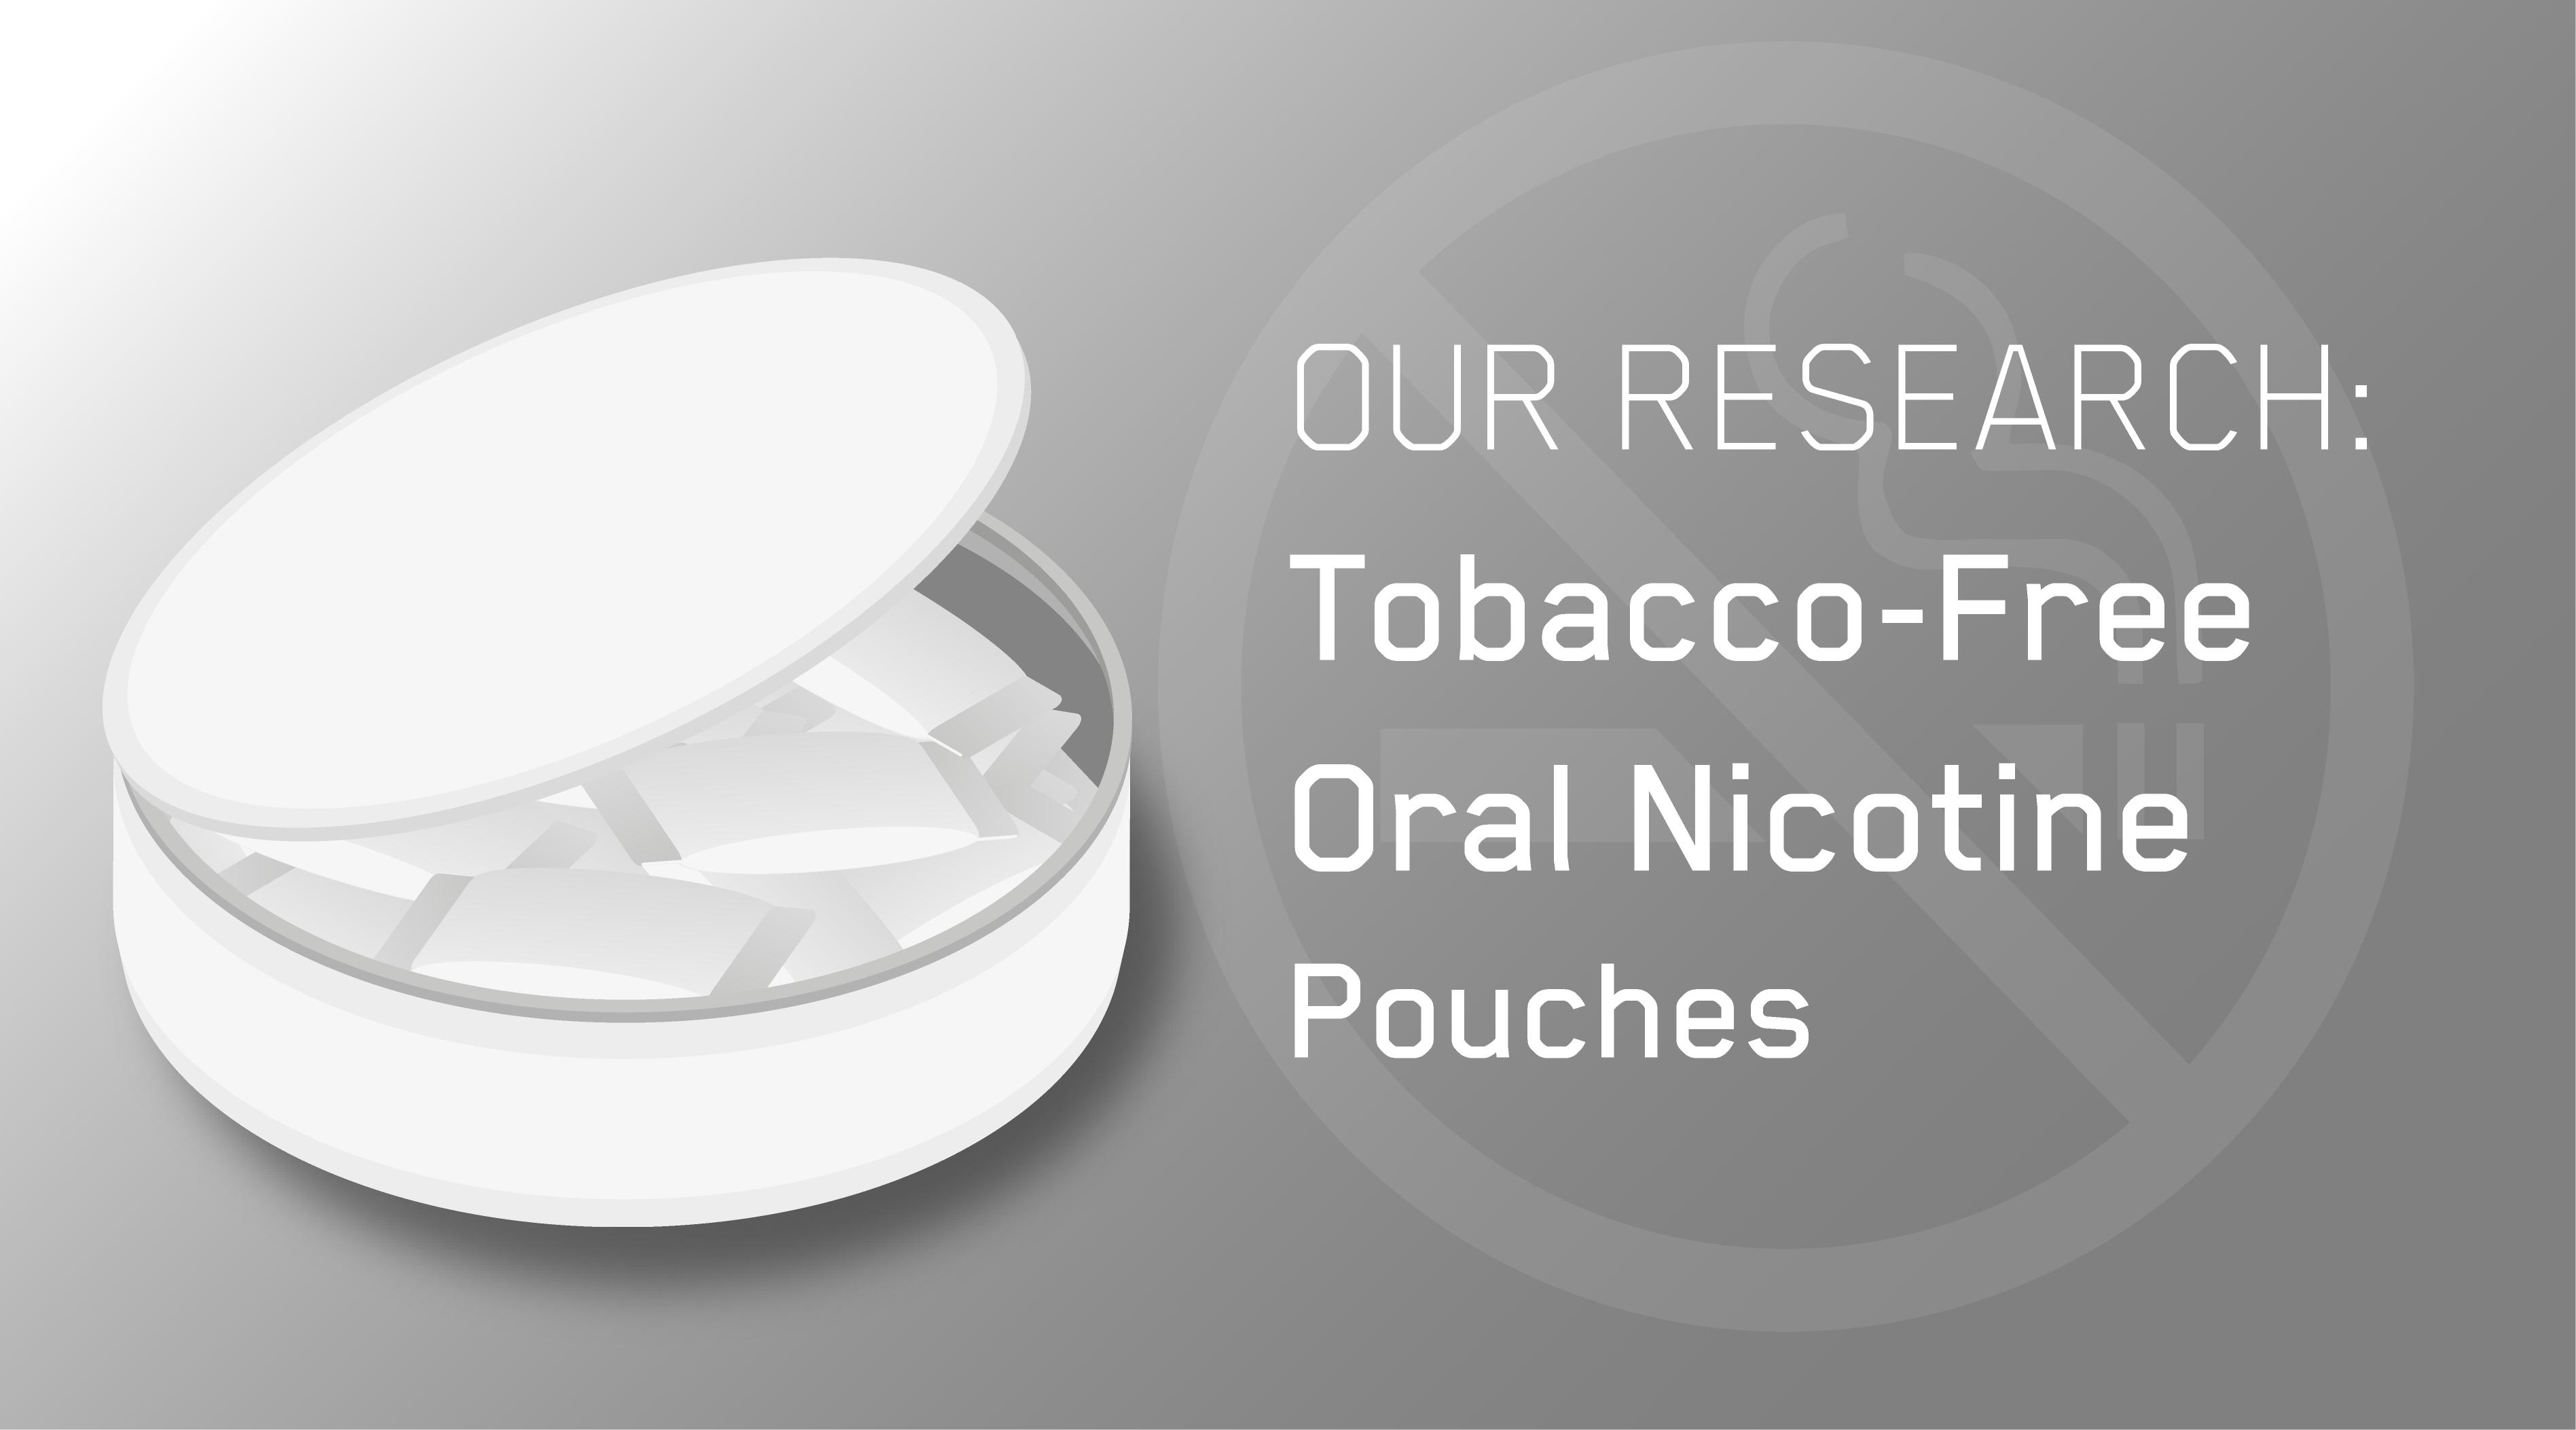 tobacco-free-oral-nicotine-pouches